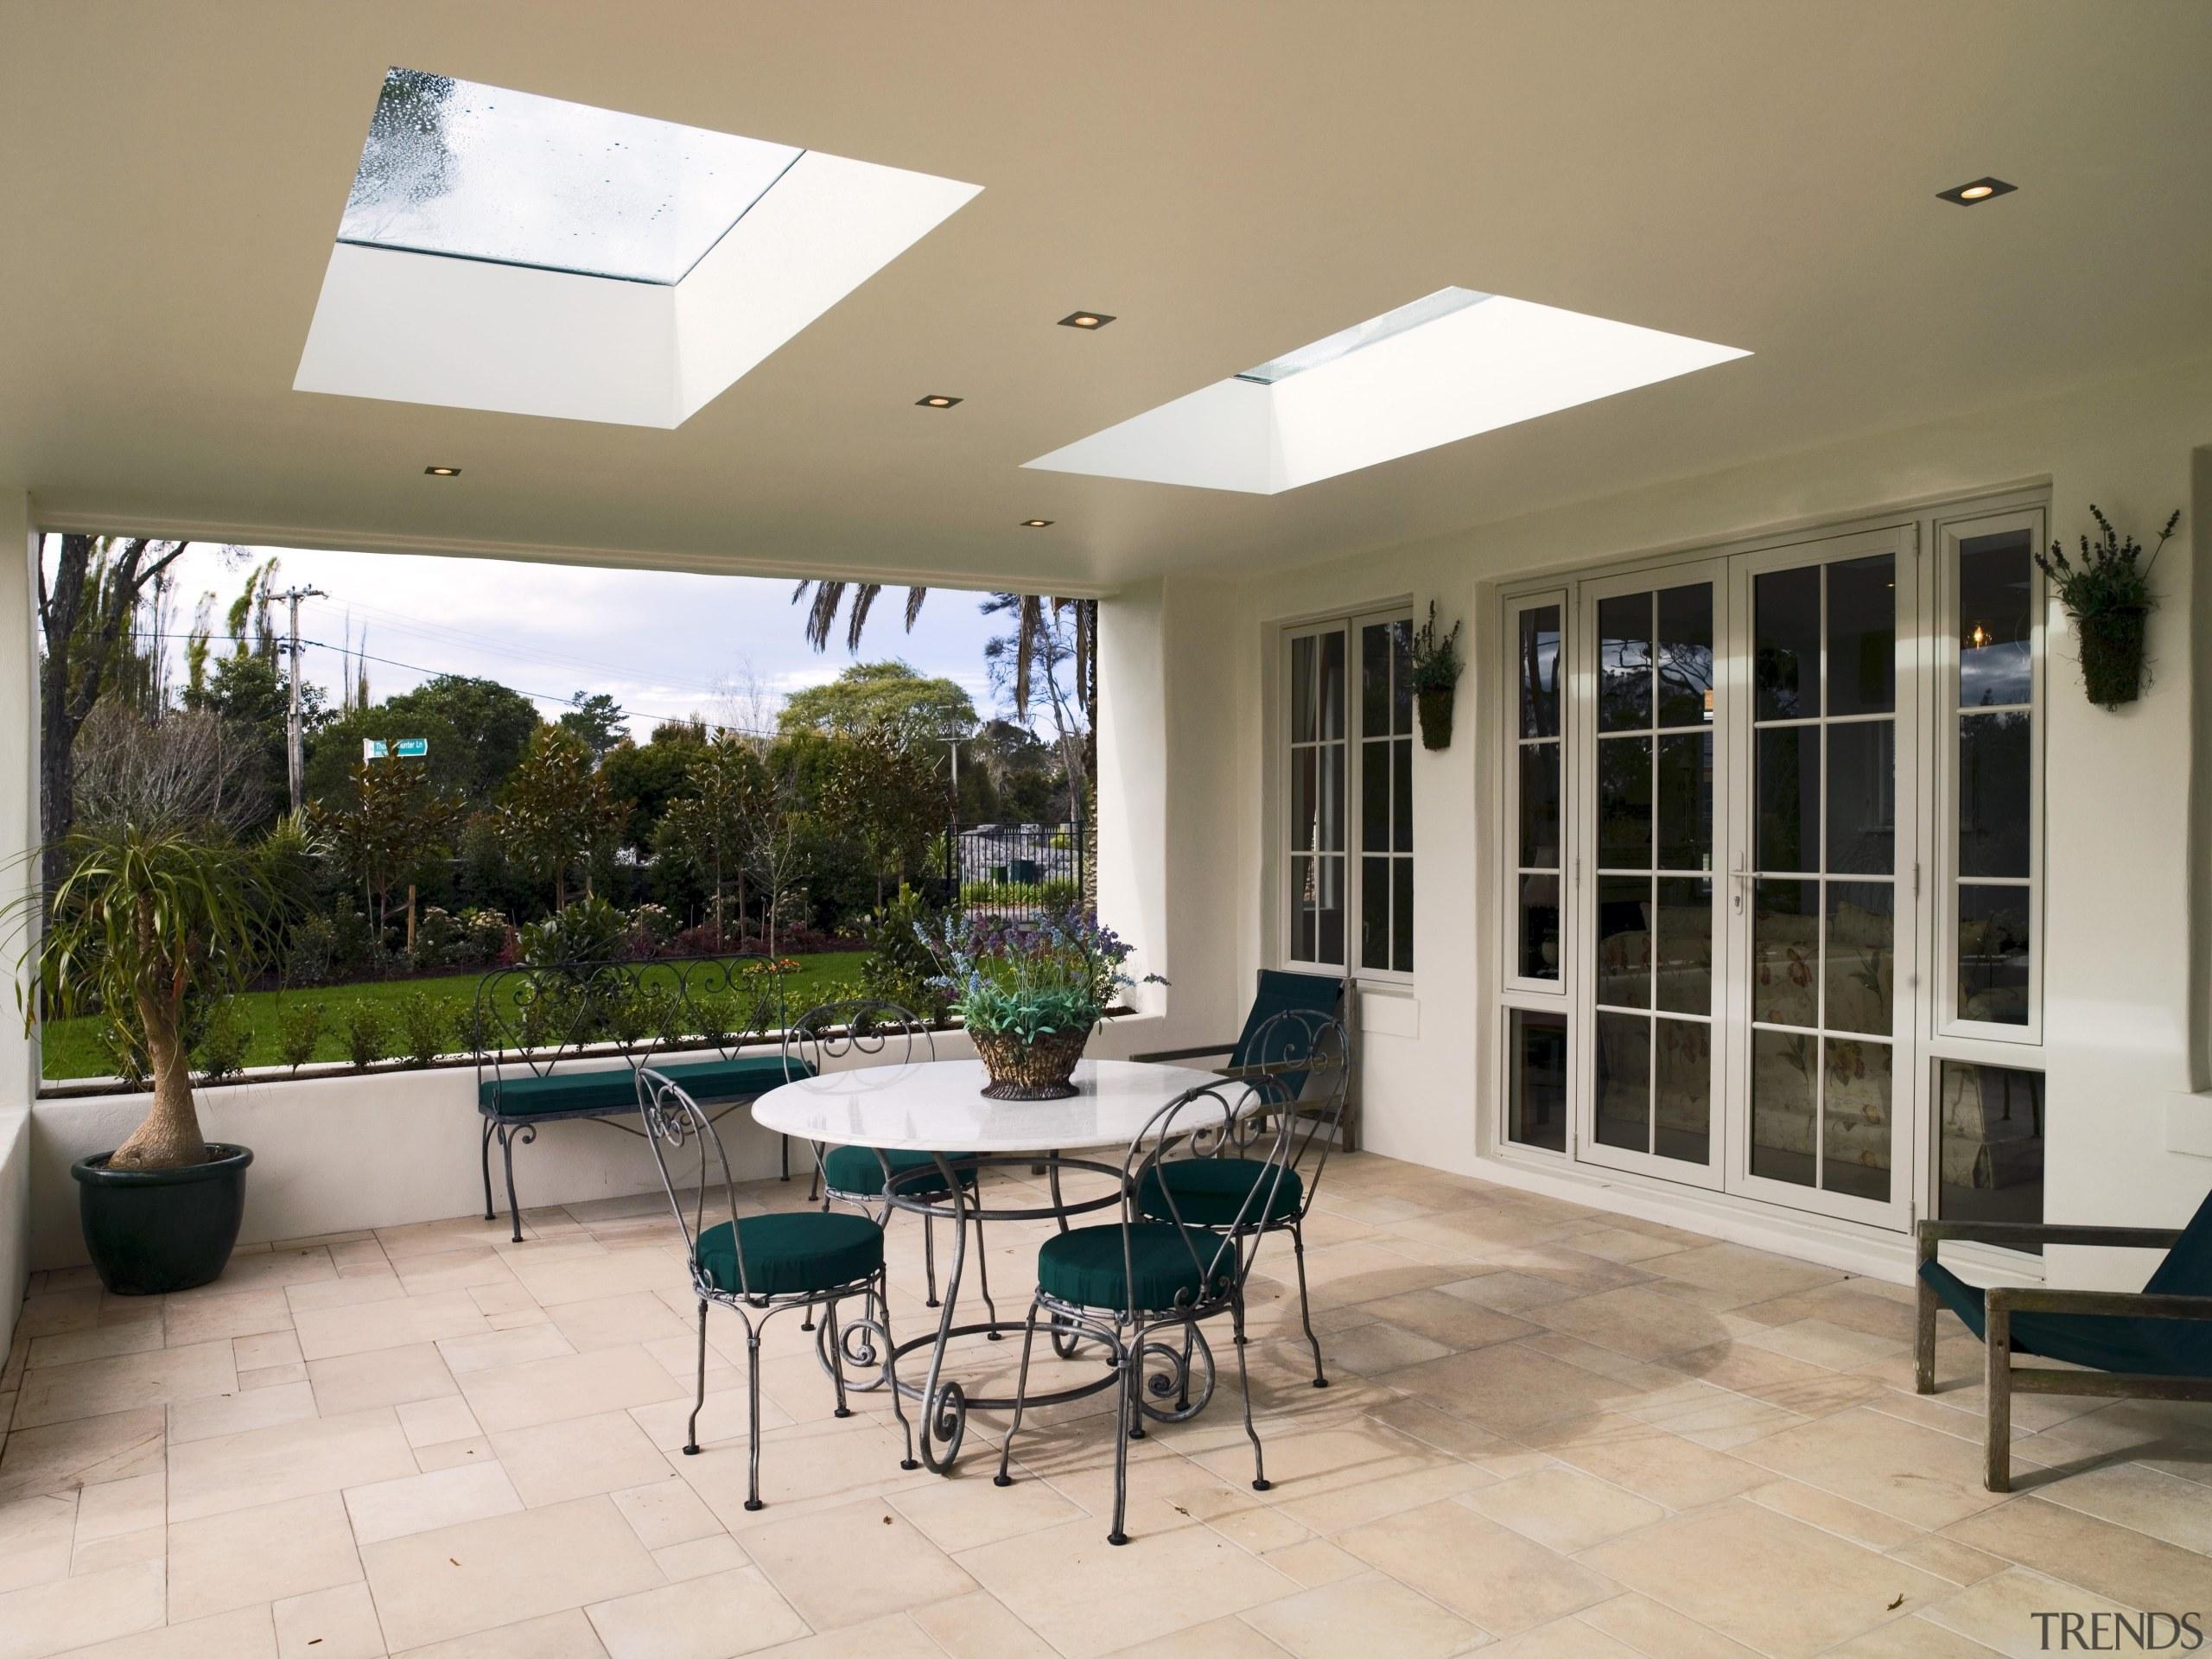 207thomas hunter 5 - Thomas_hunter_5 - estate   estate, floor, flooring, house, interior design, patio, property, real estate, window, gray, brown